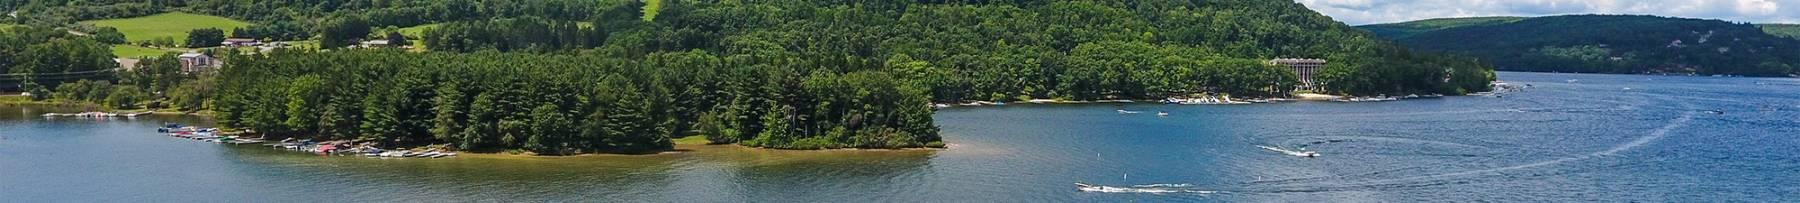 Suites at Silver Tree Deep Creek Lake